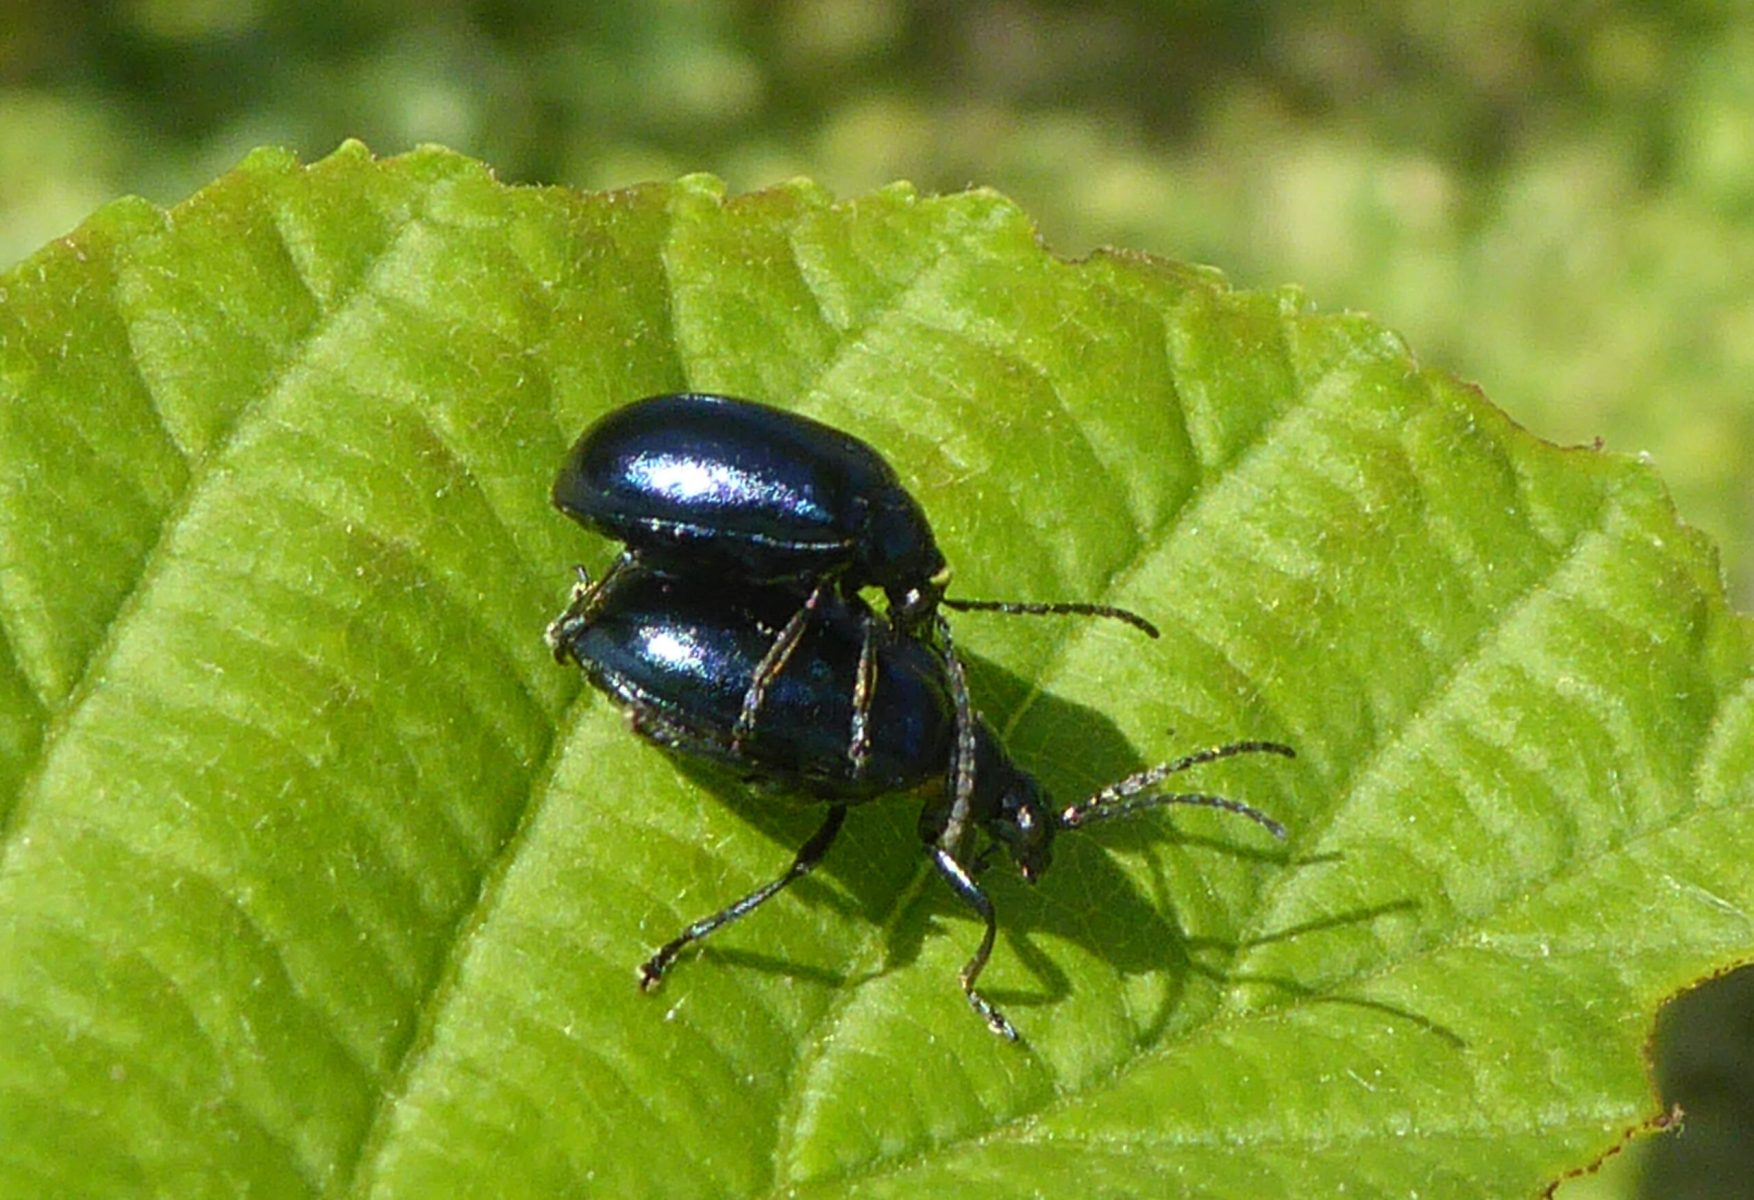 Agelastica alni - Alder Leaf Beetle